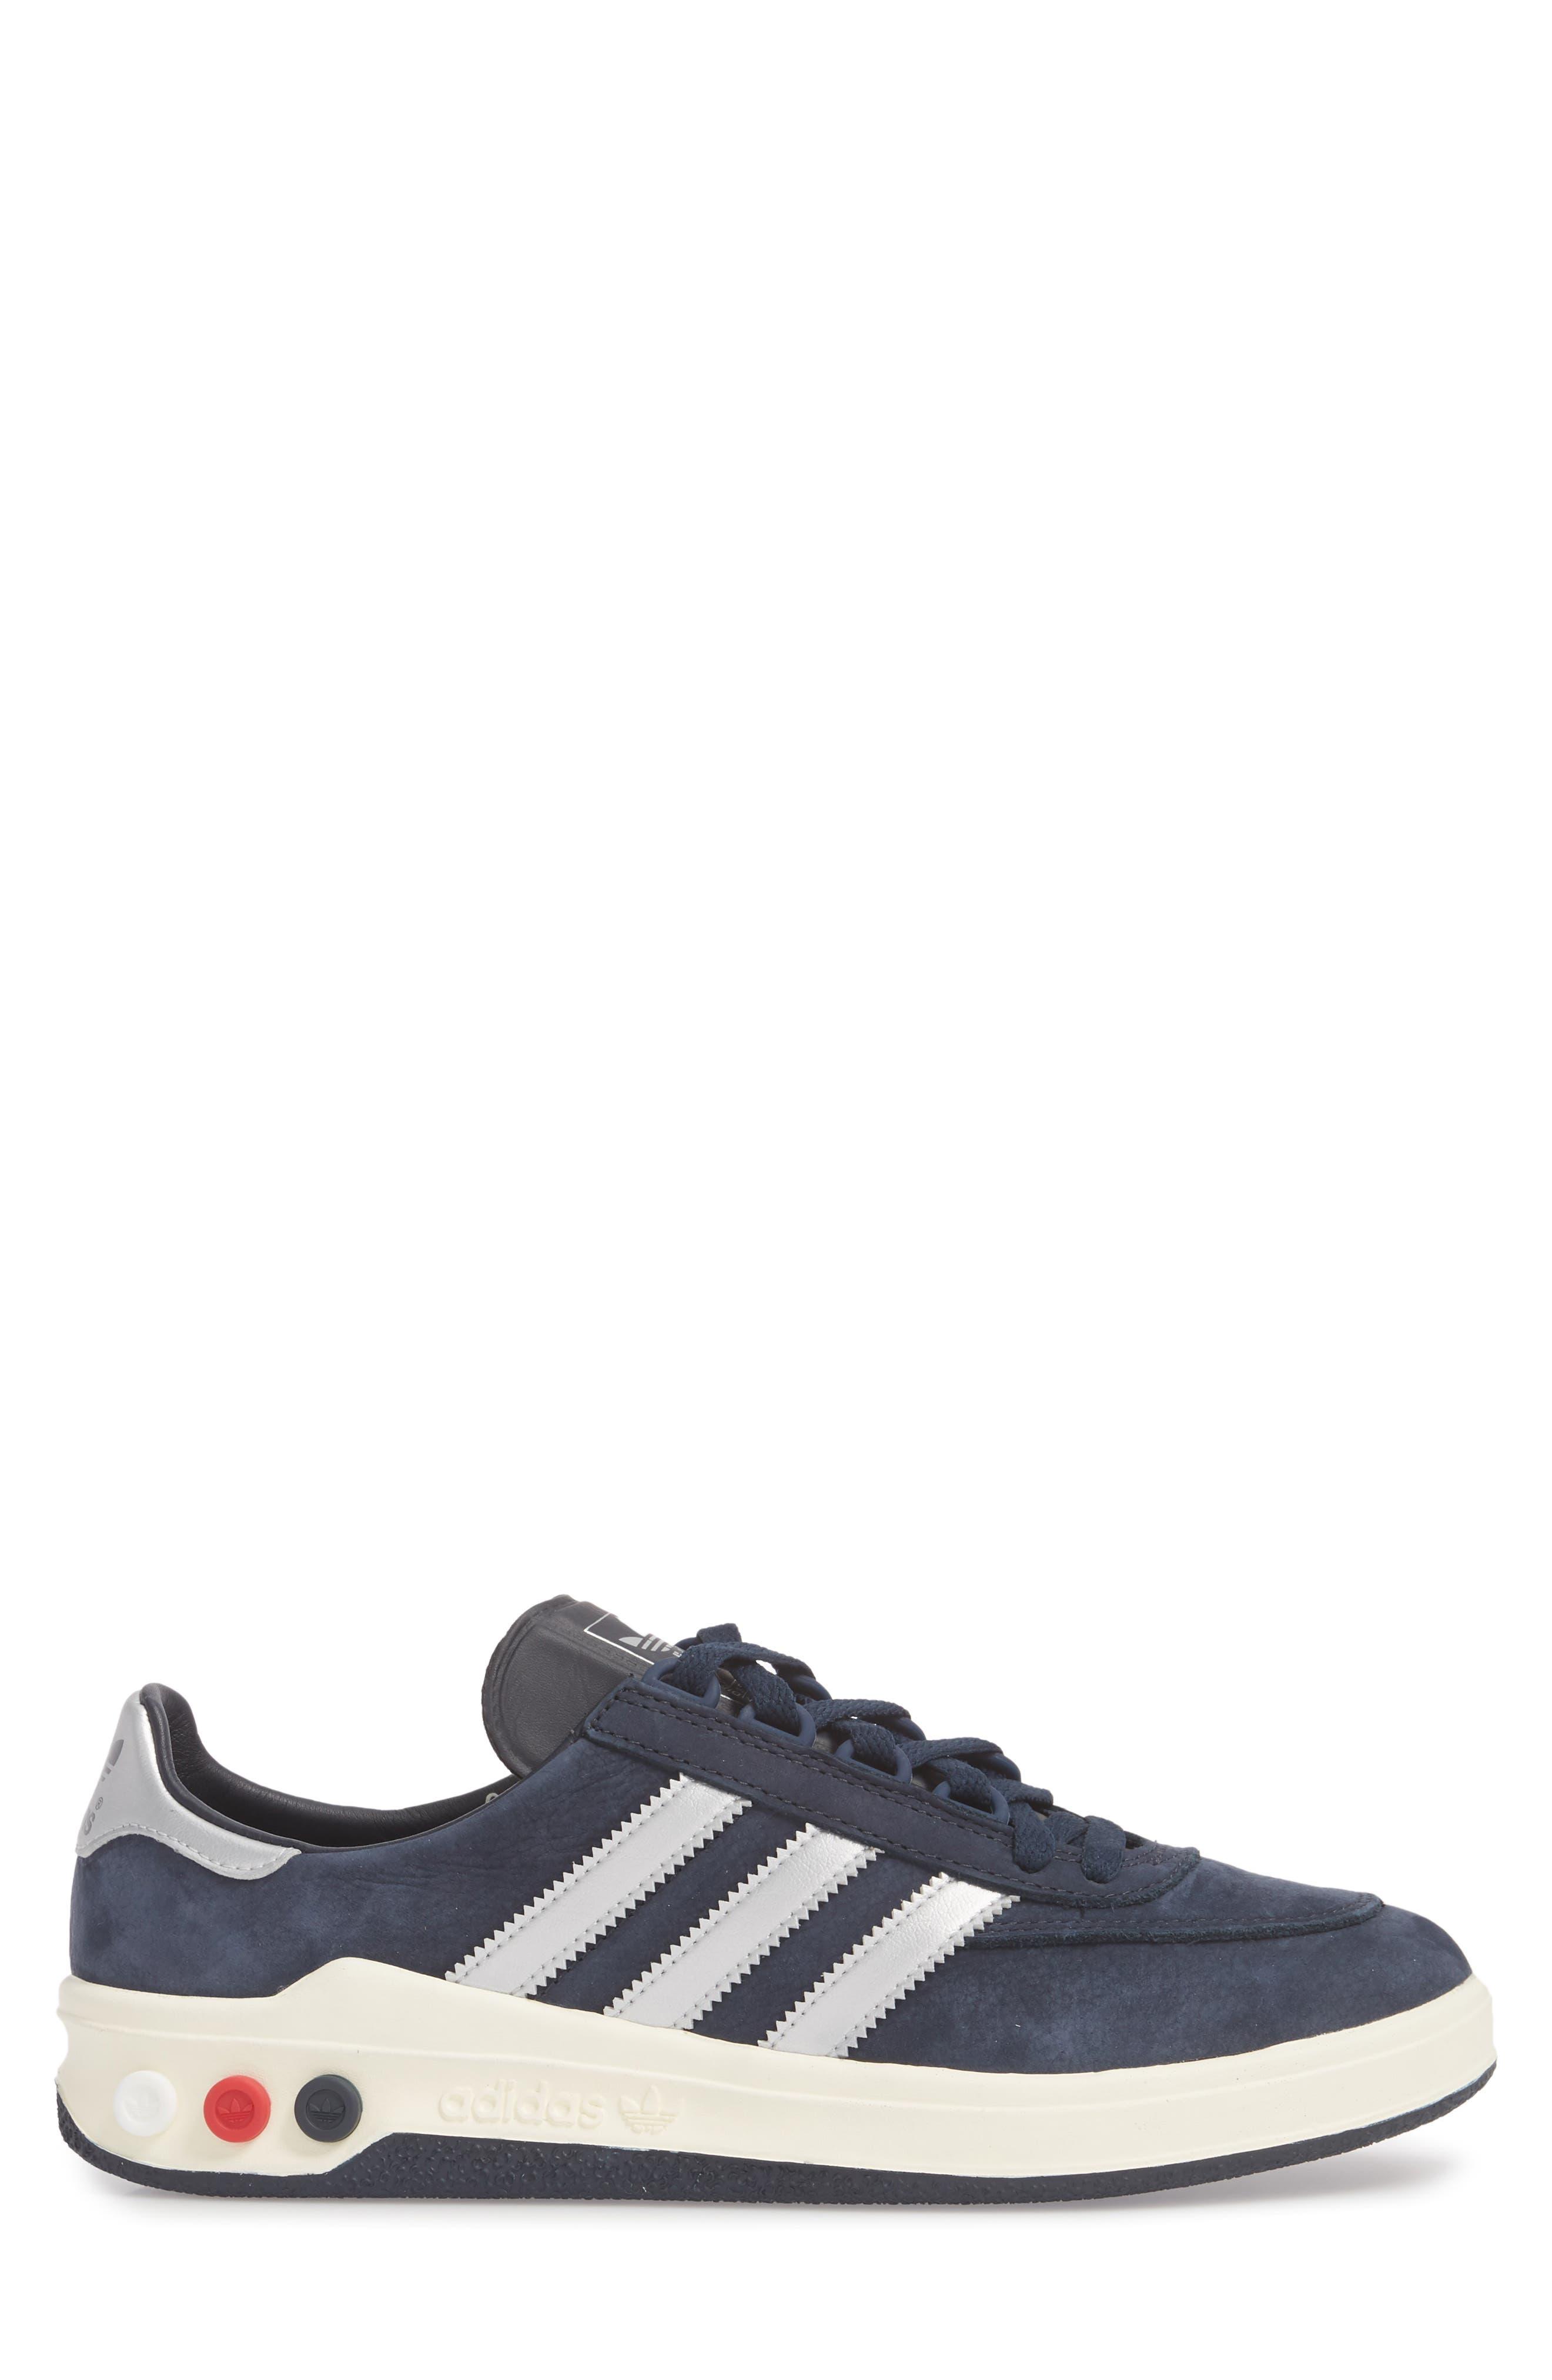 CLMBA SPZL Sneaker,                             Alternate thumbnail 3, color,                             Night Navy/ Silver/ White